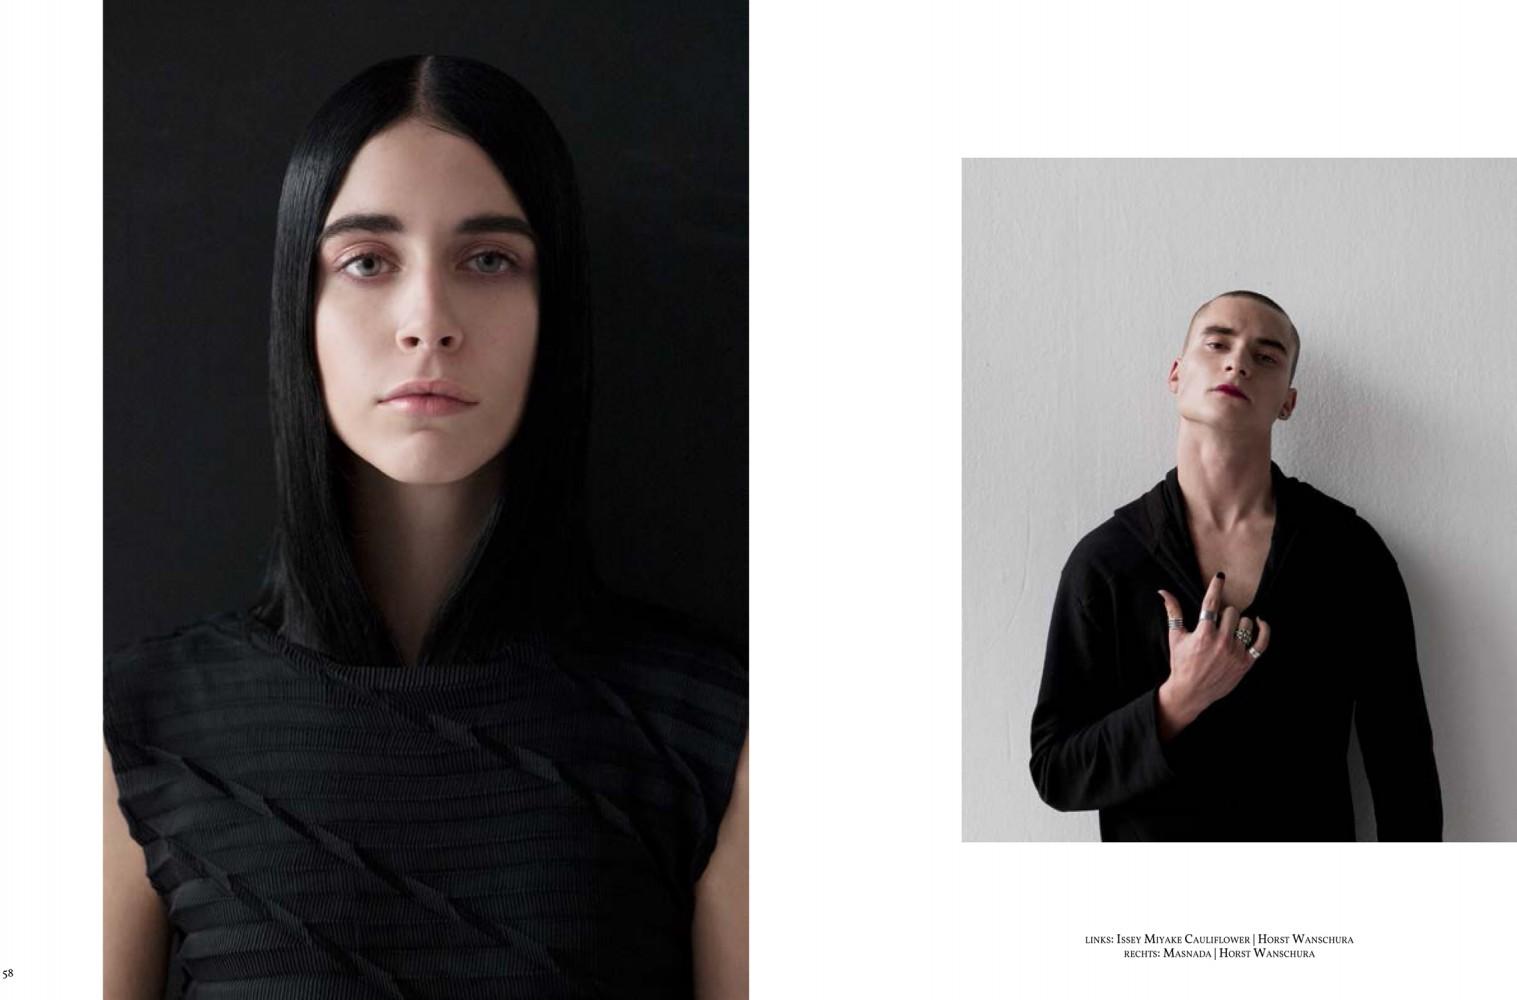 Monica-Menez-Fotostrecke-Magazin-6